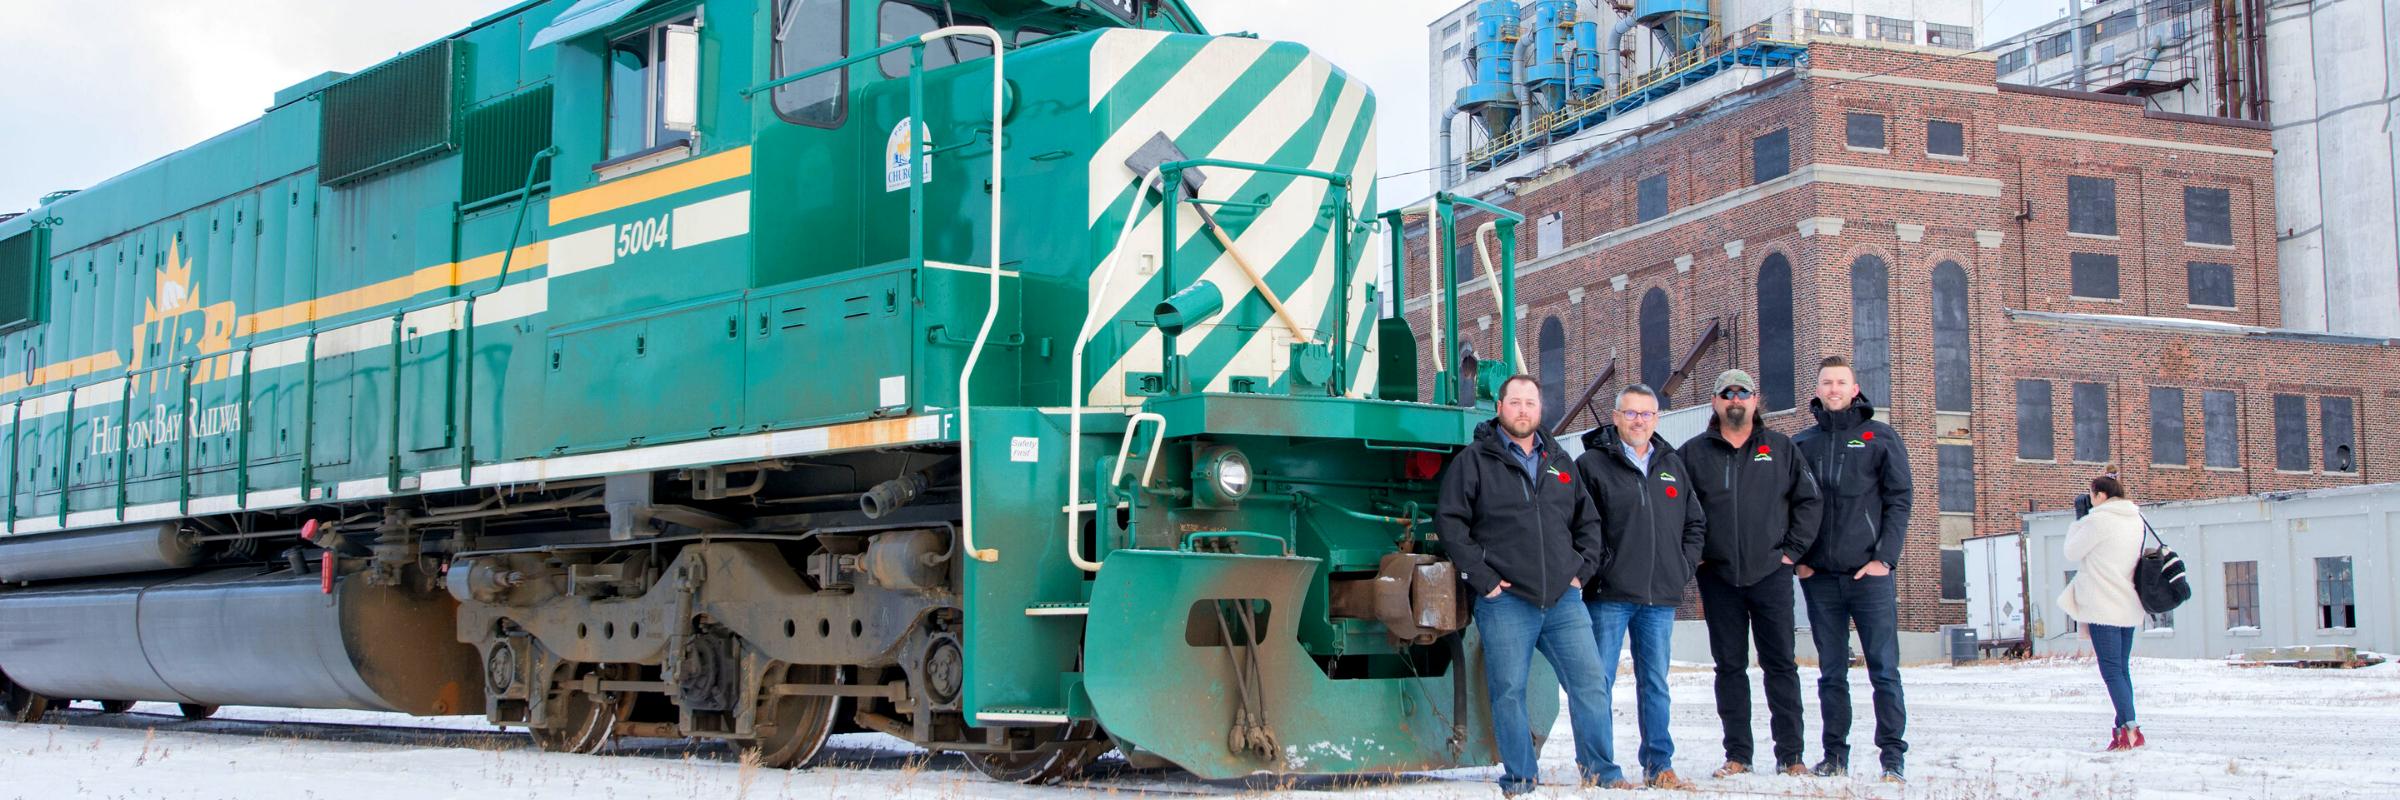 Paradox helps repair the Hudson Bay Rail Line following the 2017 floods